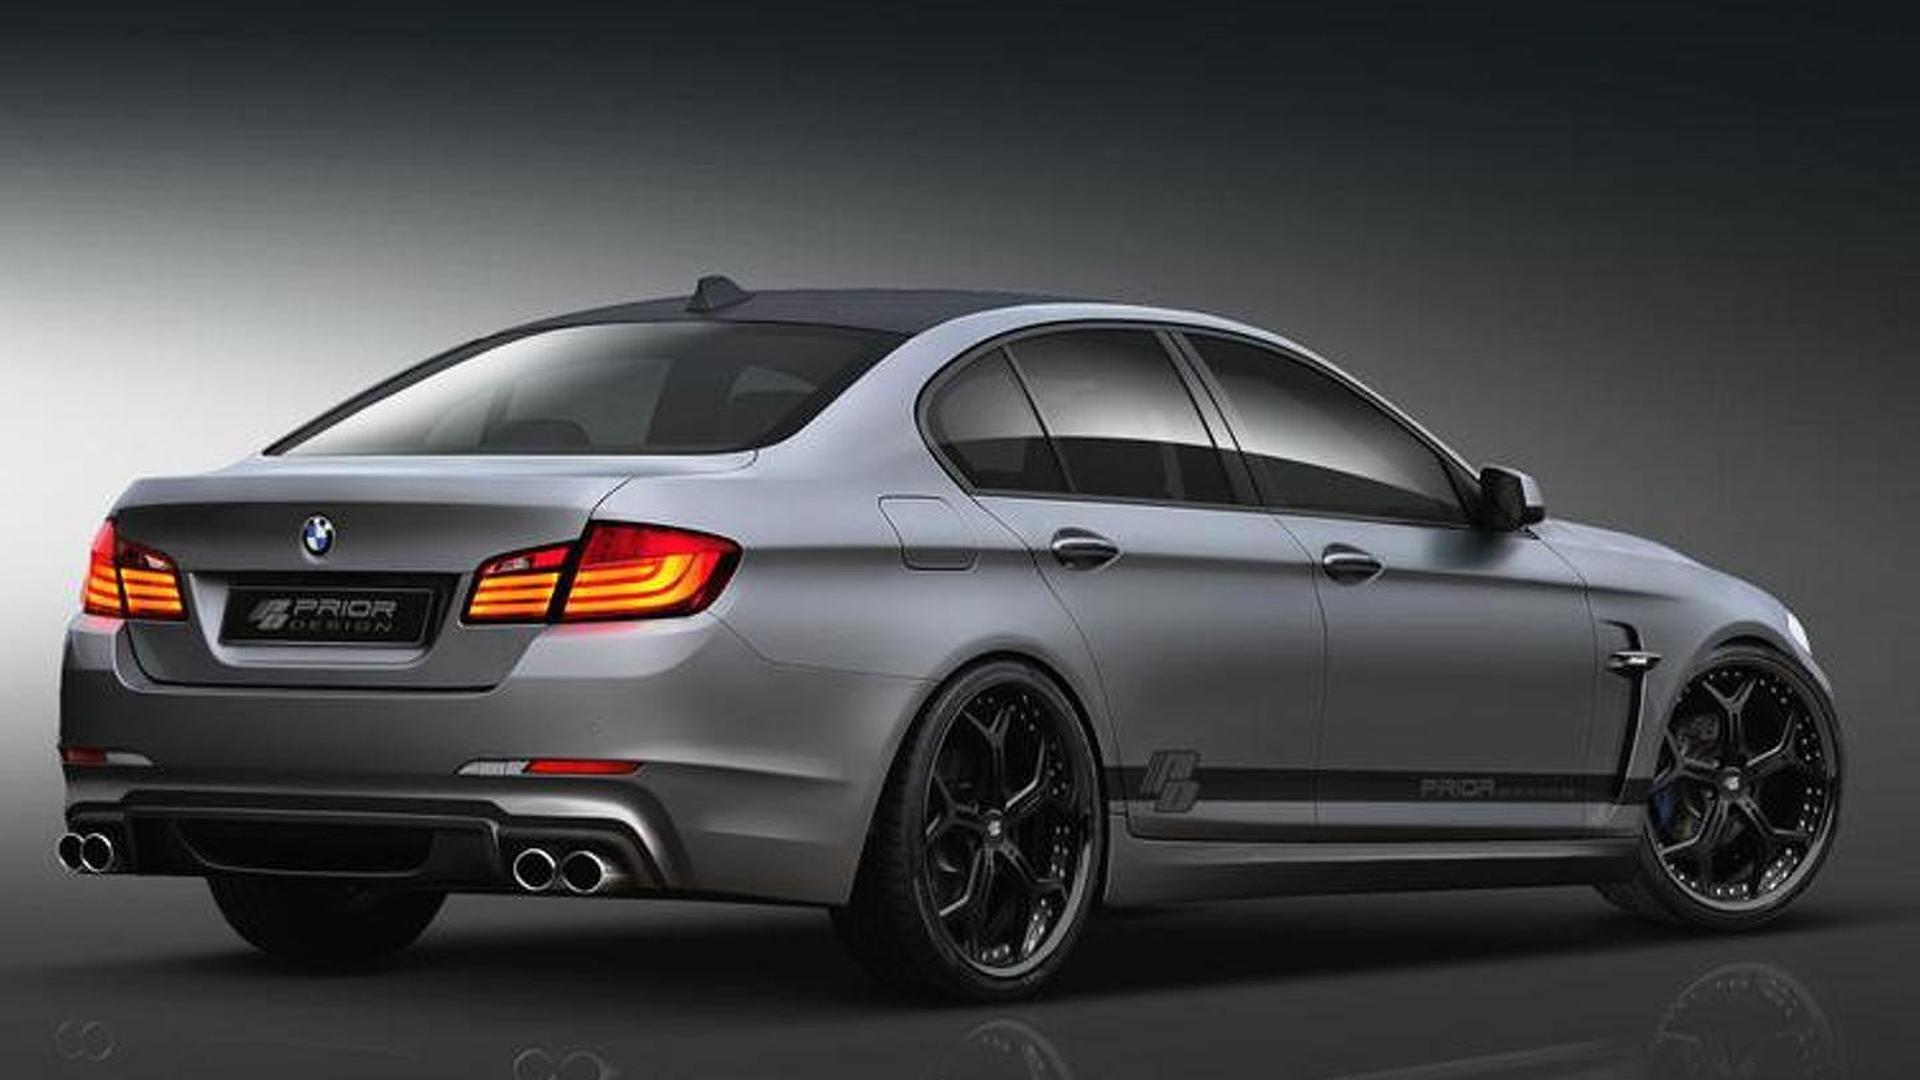 Spiksplinternieuw BMW 5-Series F10 Prior Design aerodynamic-kit preview LB-98